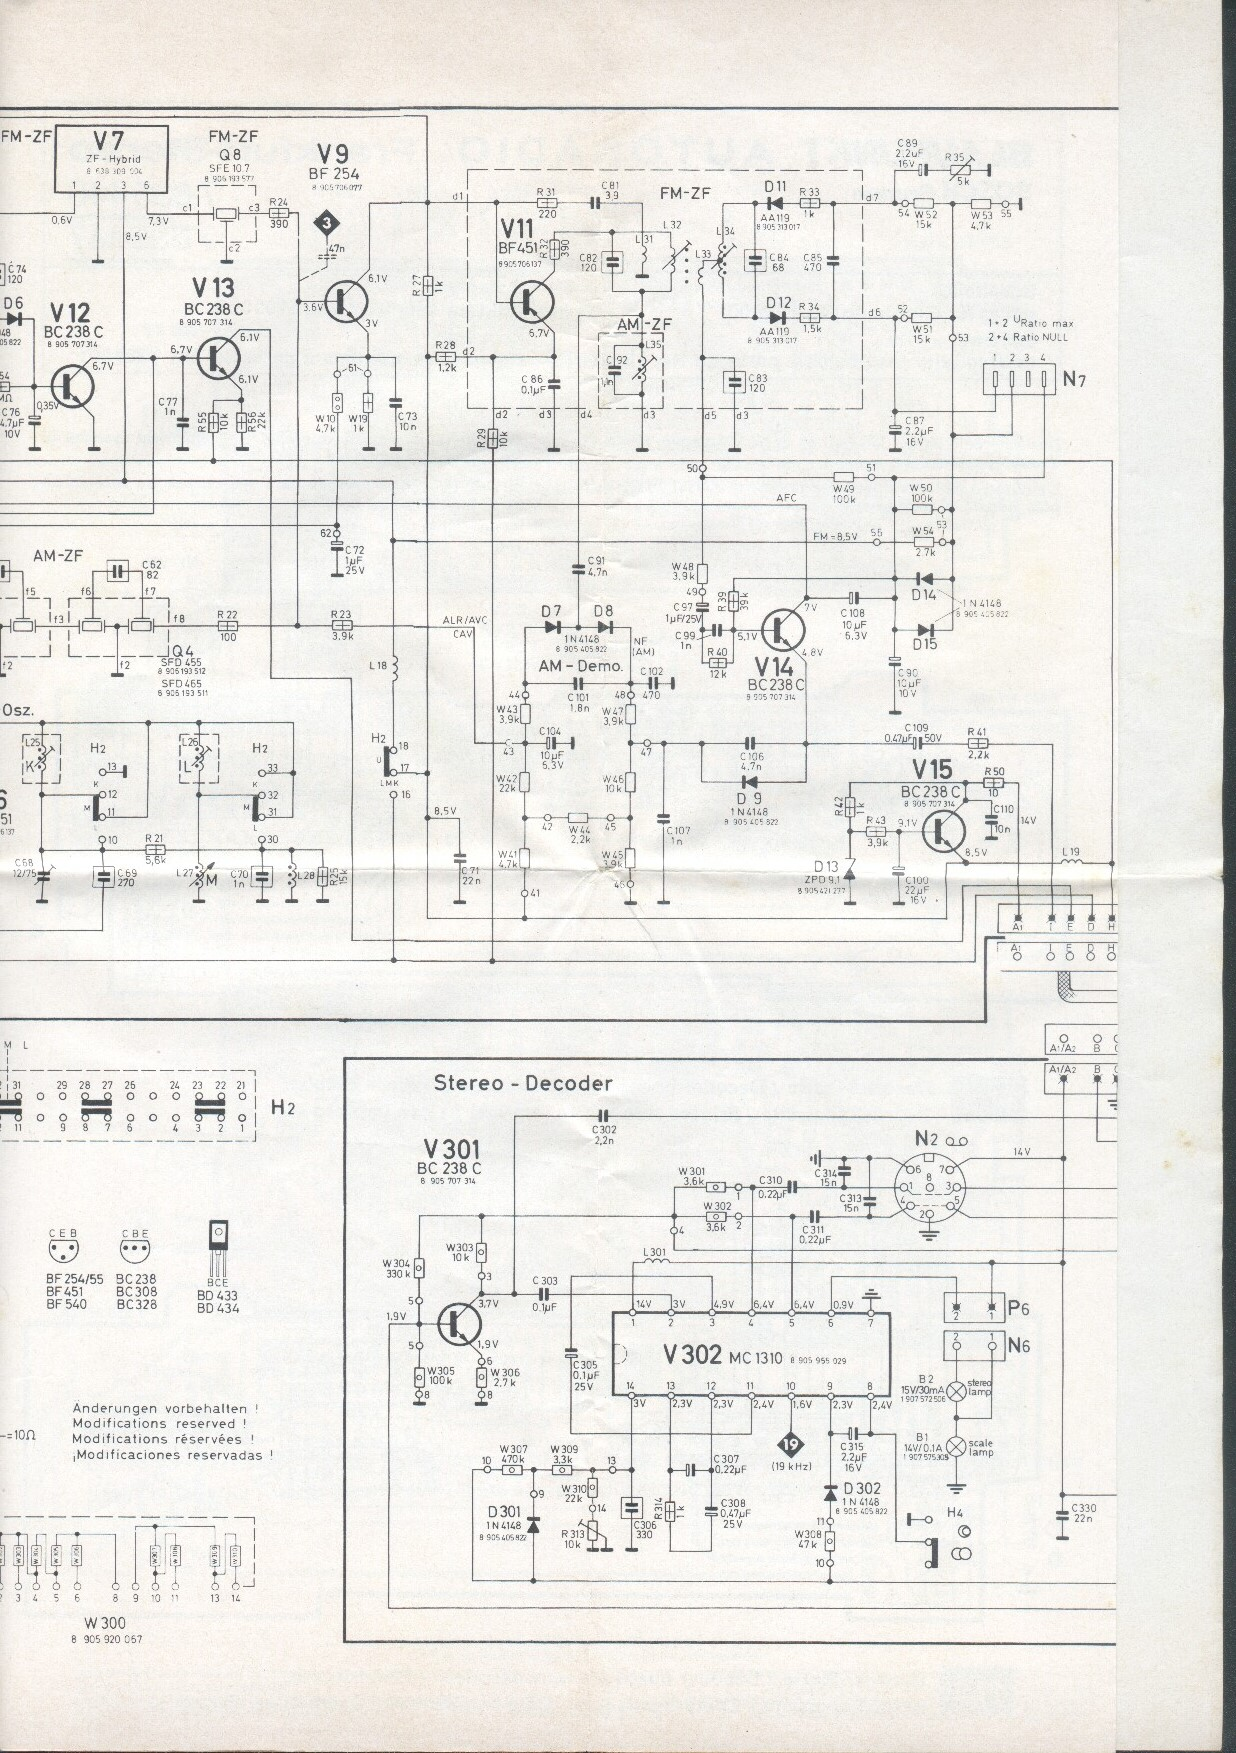 1975 blaupunkt frankfurt stereo schematic. Black Bedroom Furniture Sets. Home Design Ideas